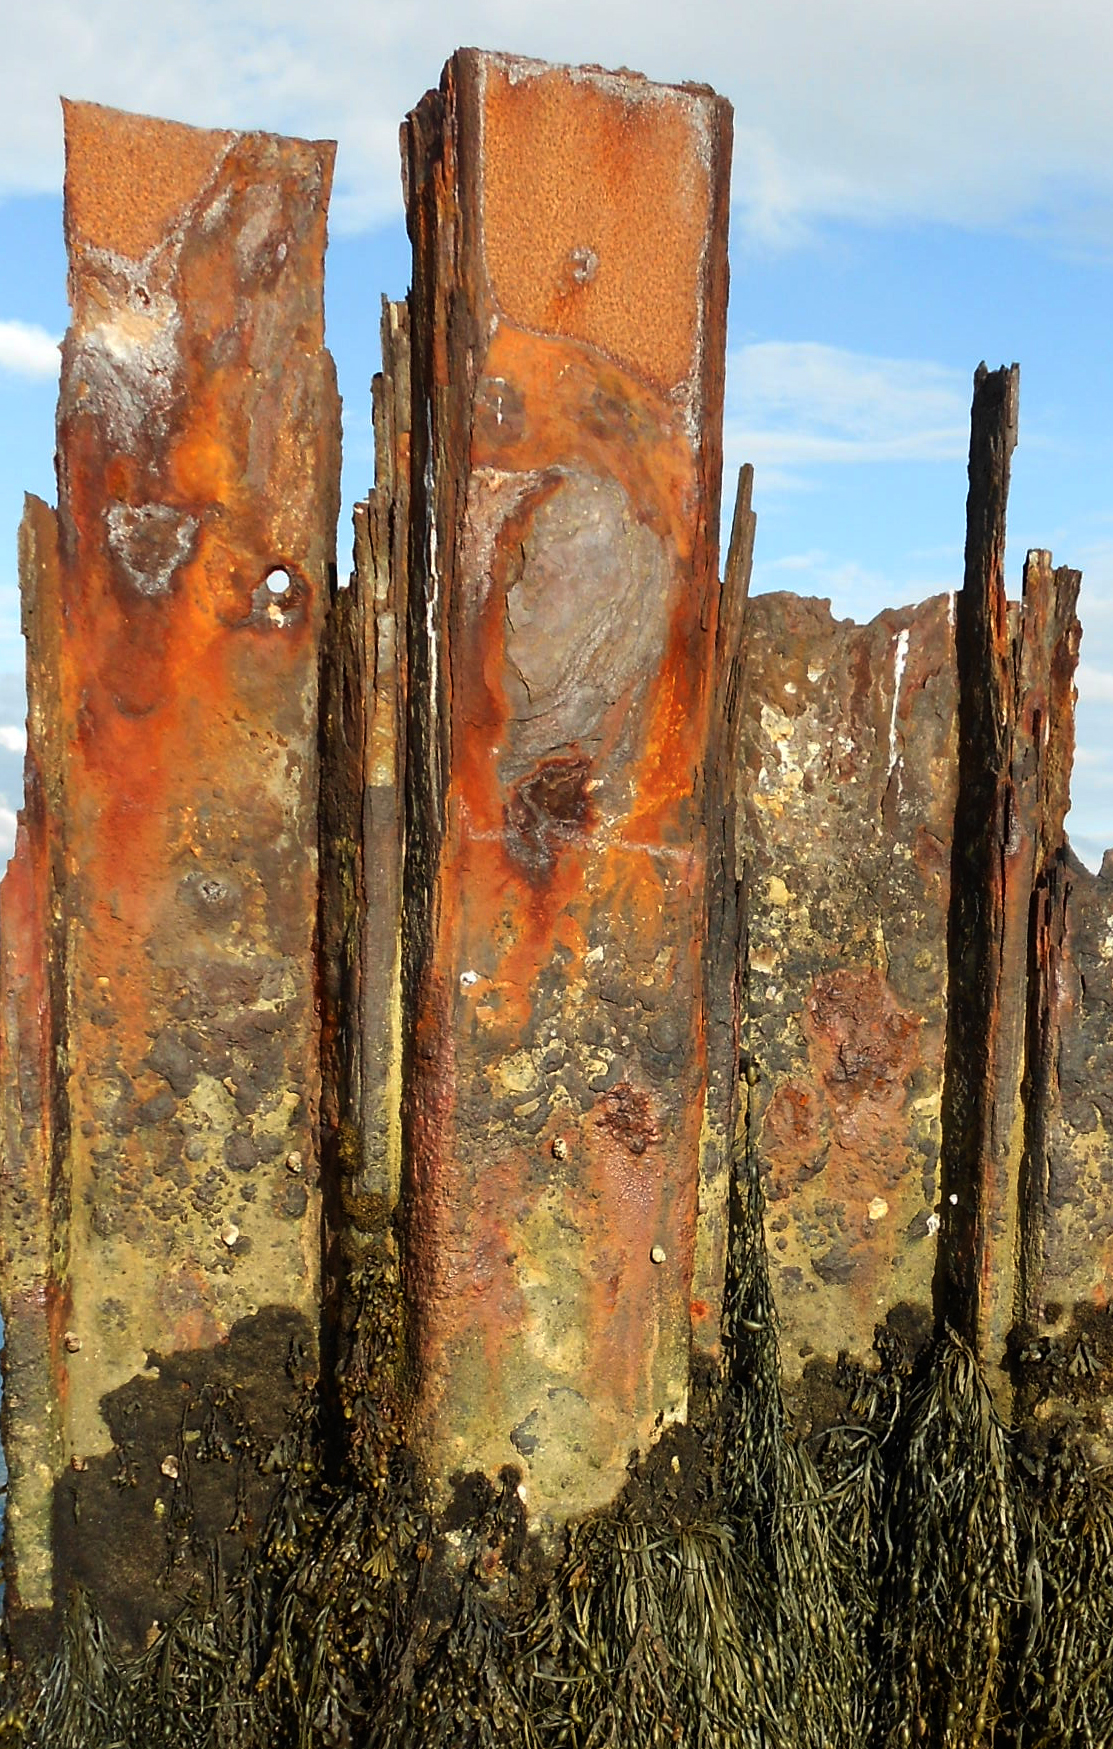 Lymington metal texture